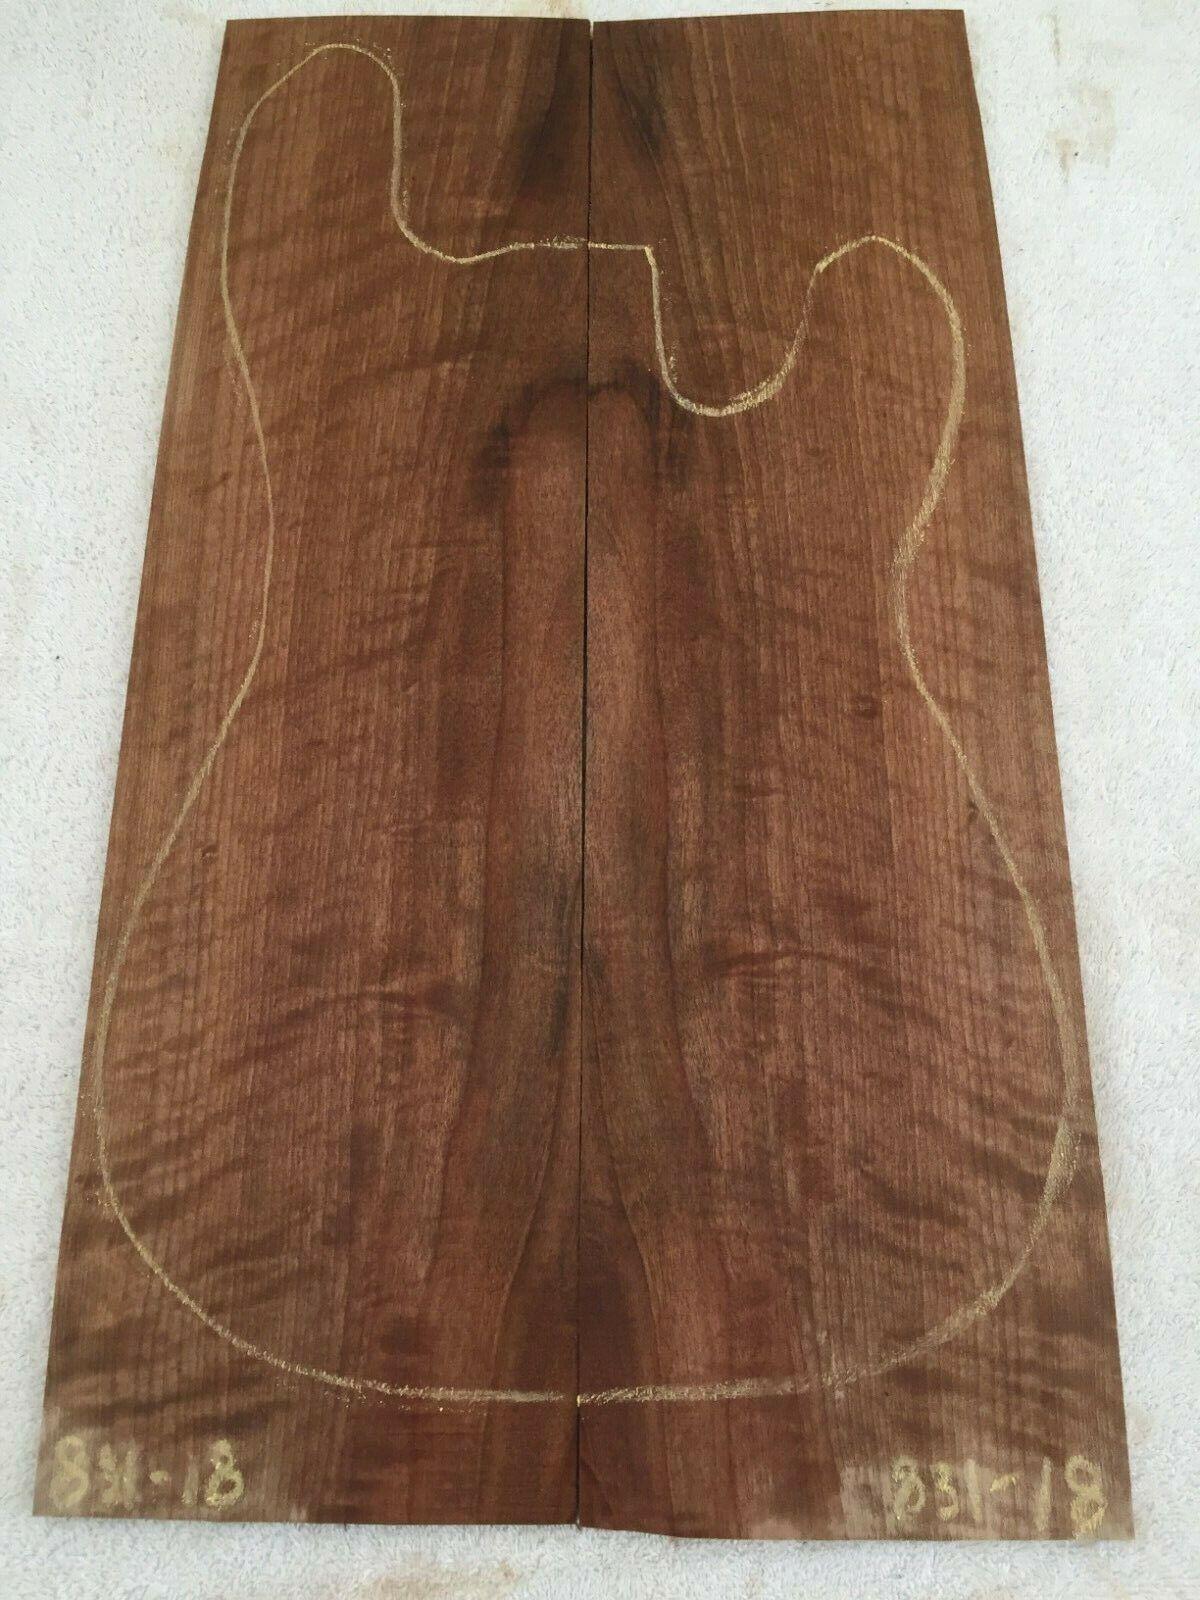 English Walnut Bookmatch Set Guitar Tone Wood -.27 x 12-14 x 22.5 -  831-18